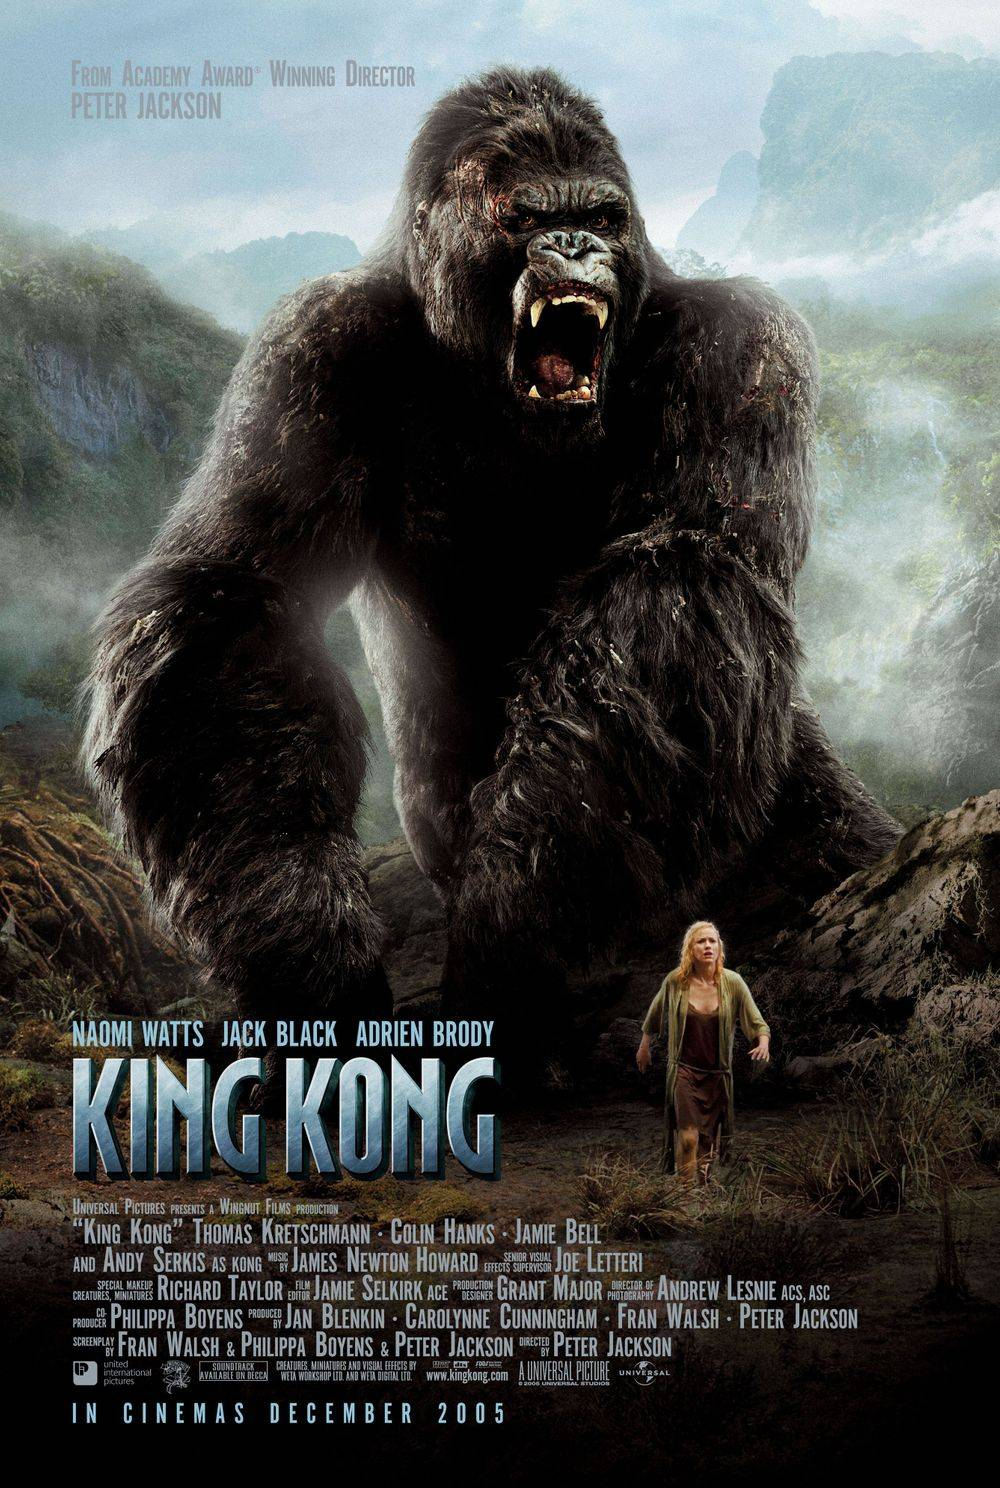 Movie poster for King Kong starring Jack Black & Naomi Watts